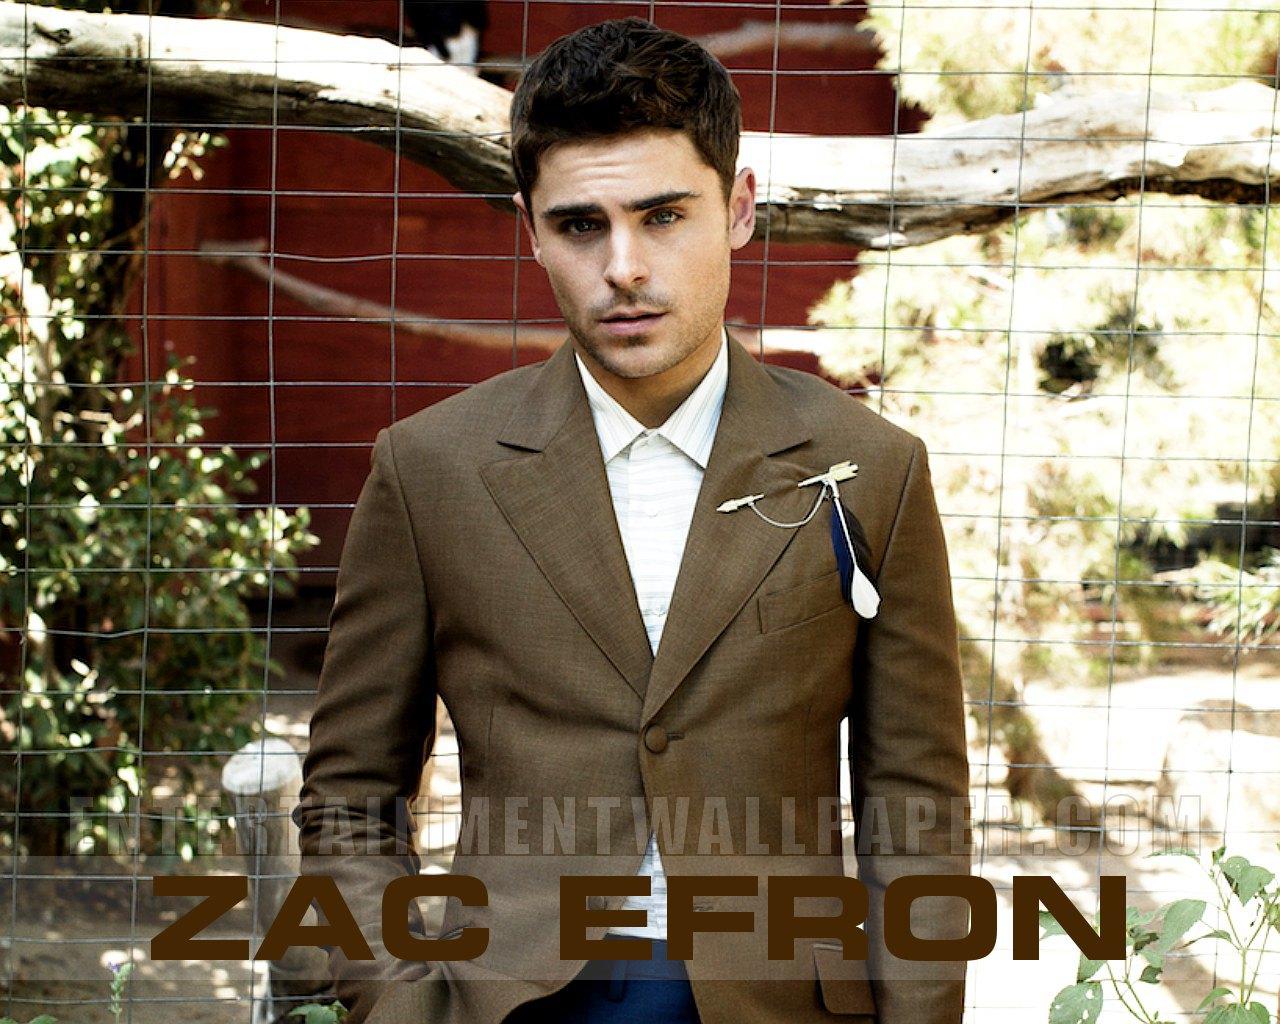 zac efron wallpaper handsome